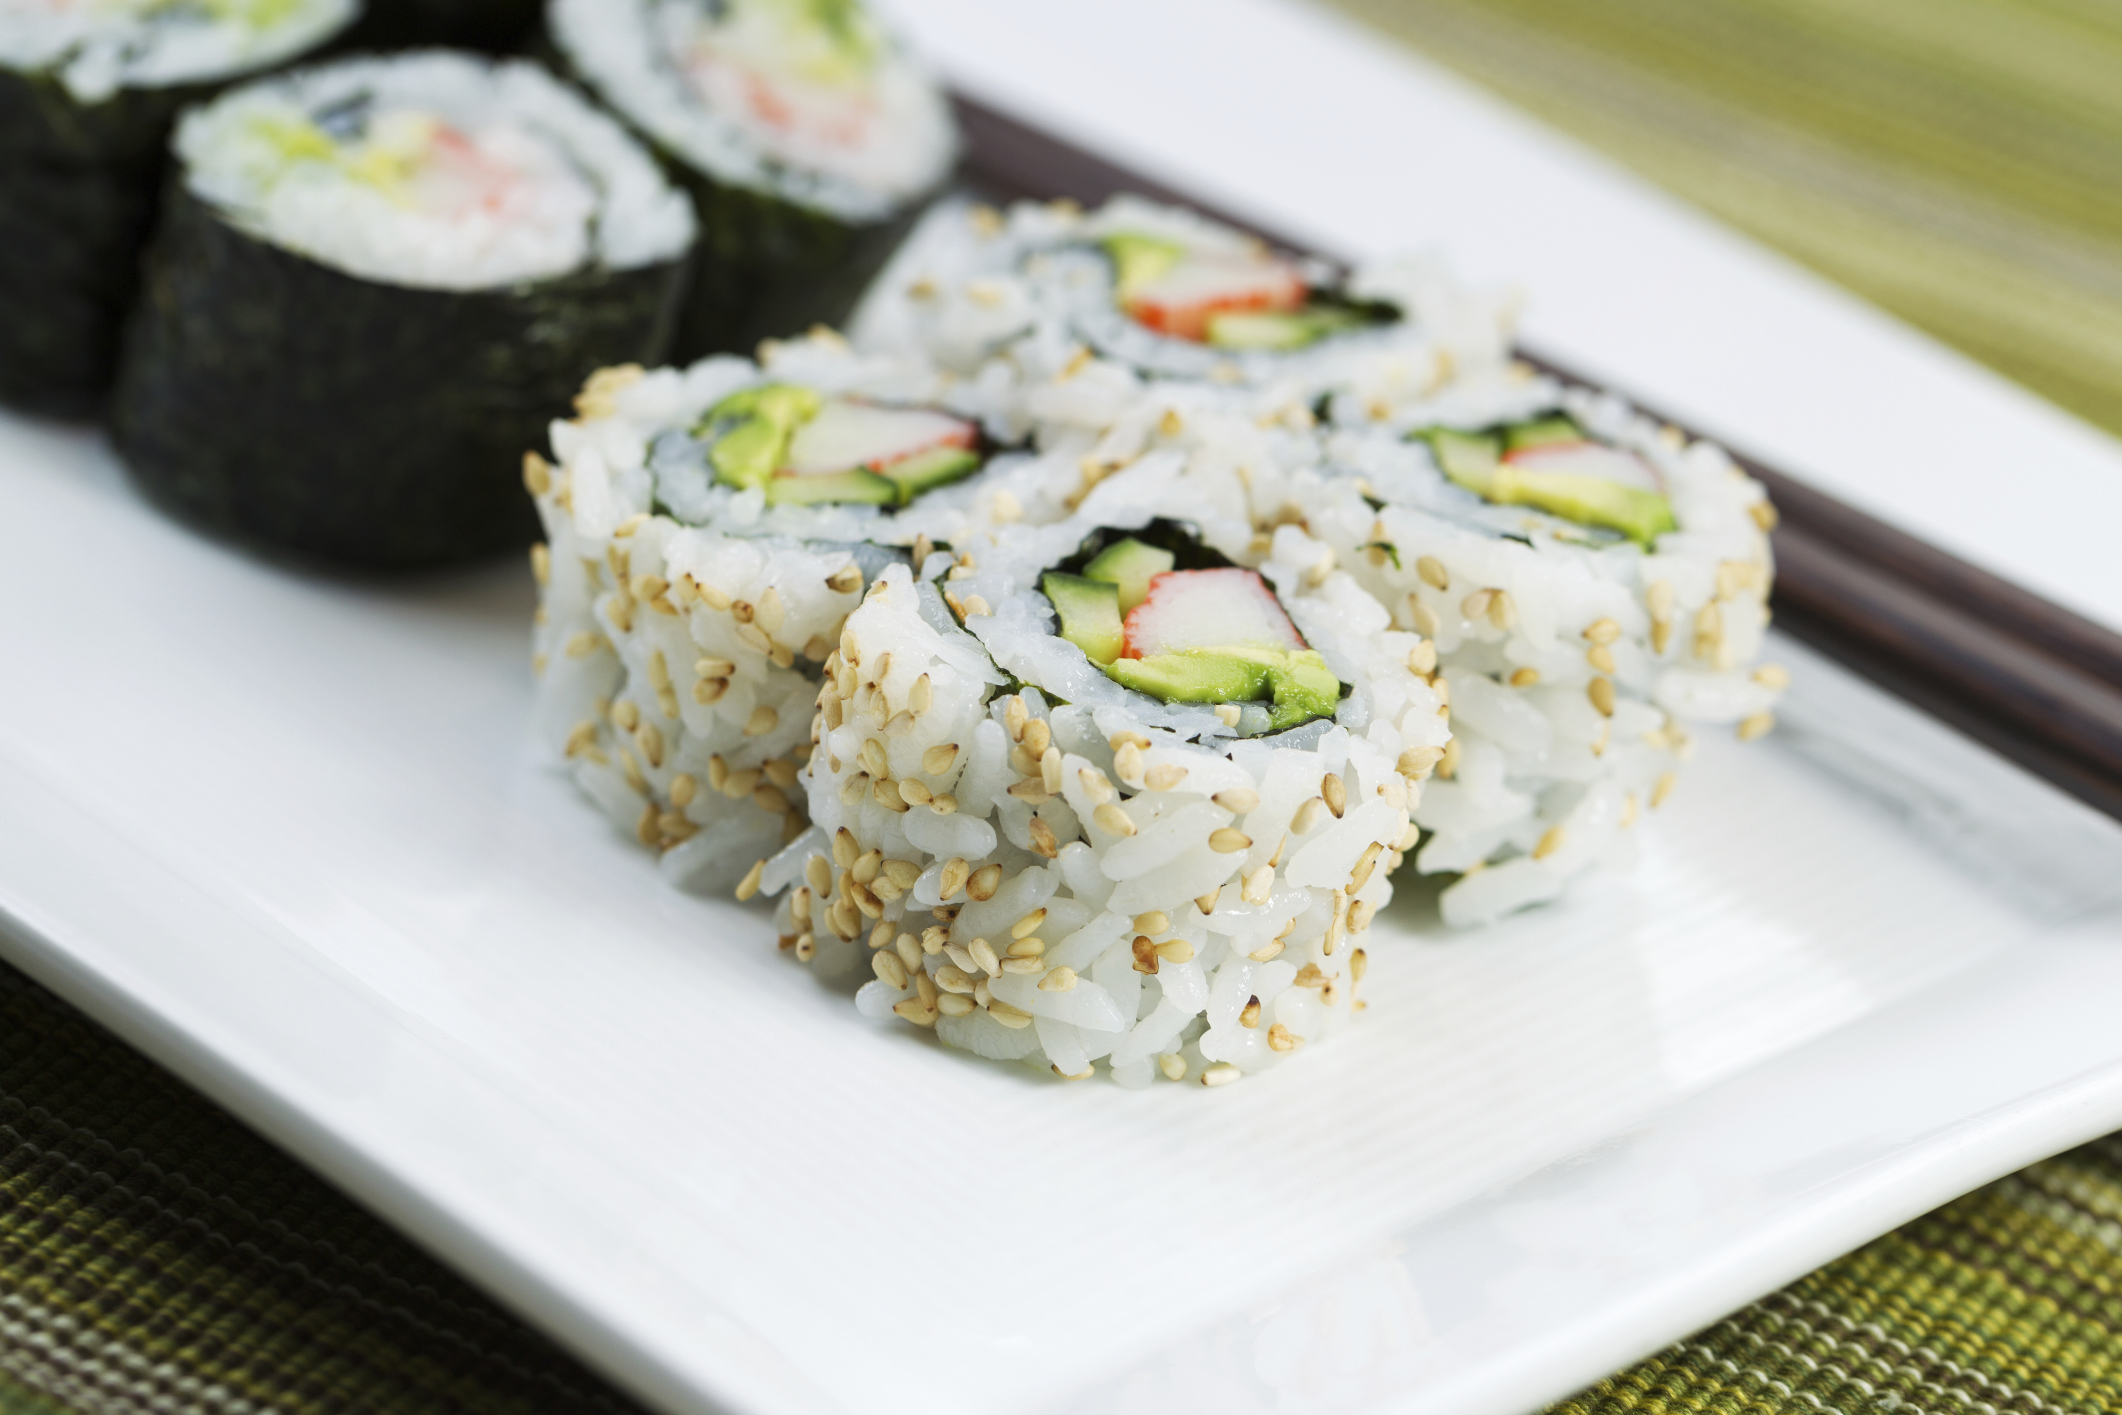 nutritional information on publix sushi livestrong com